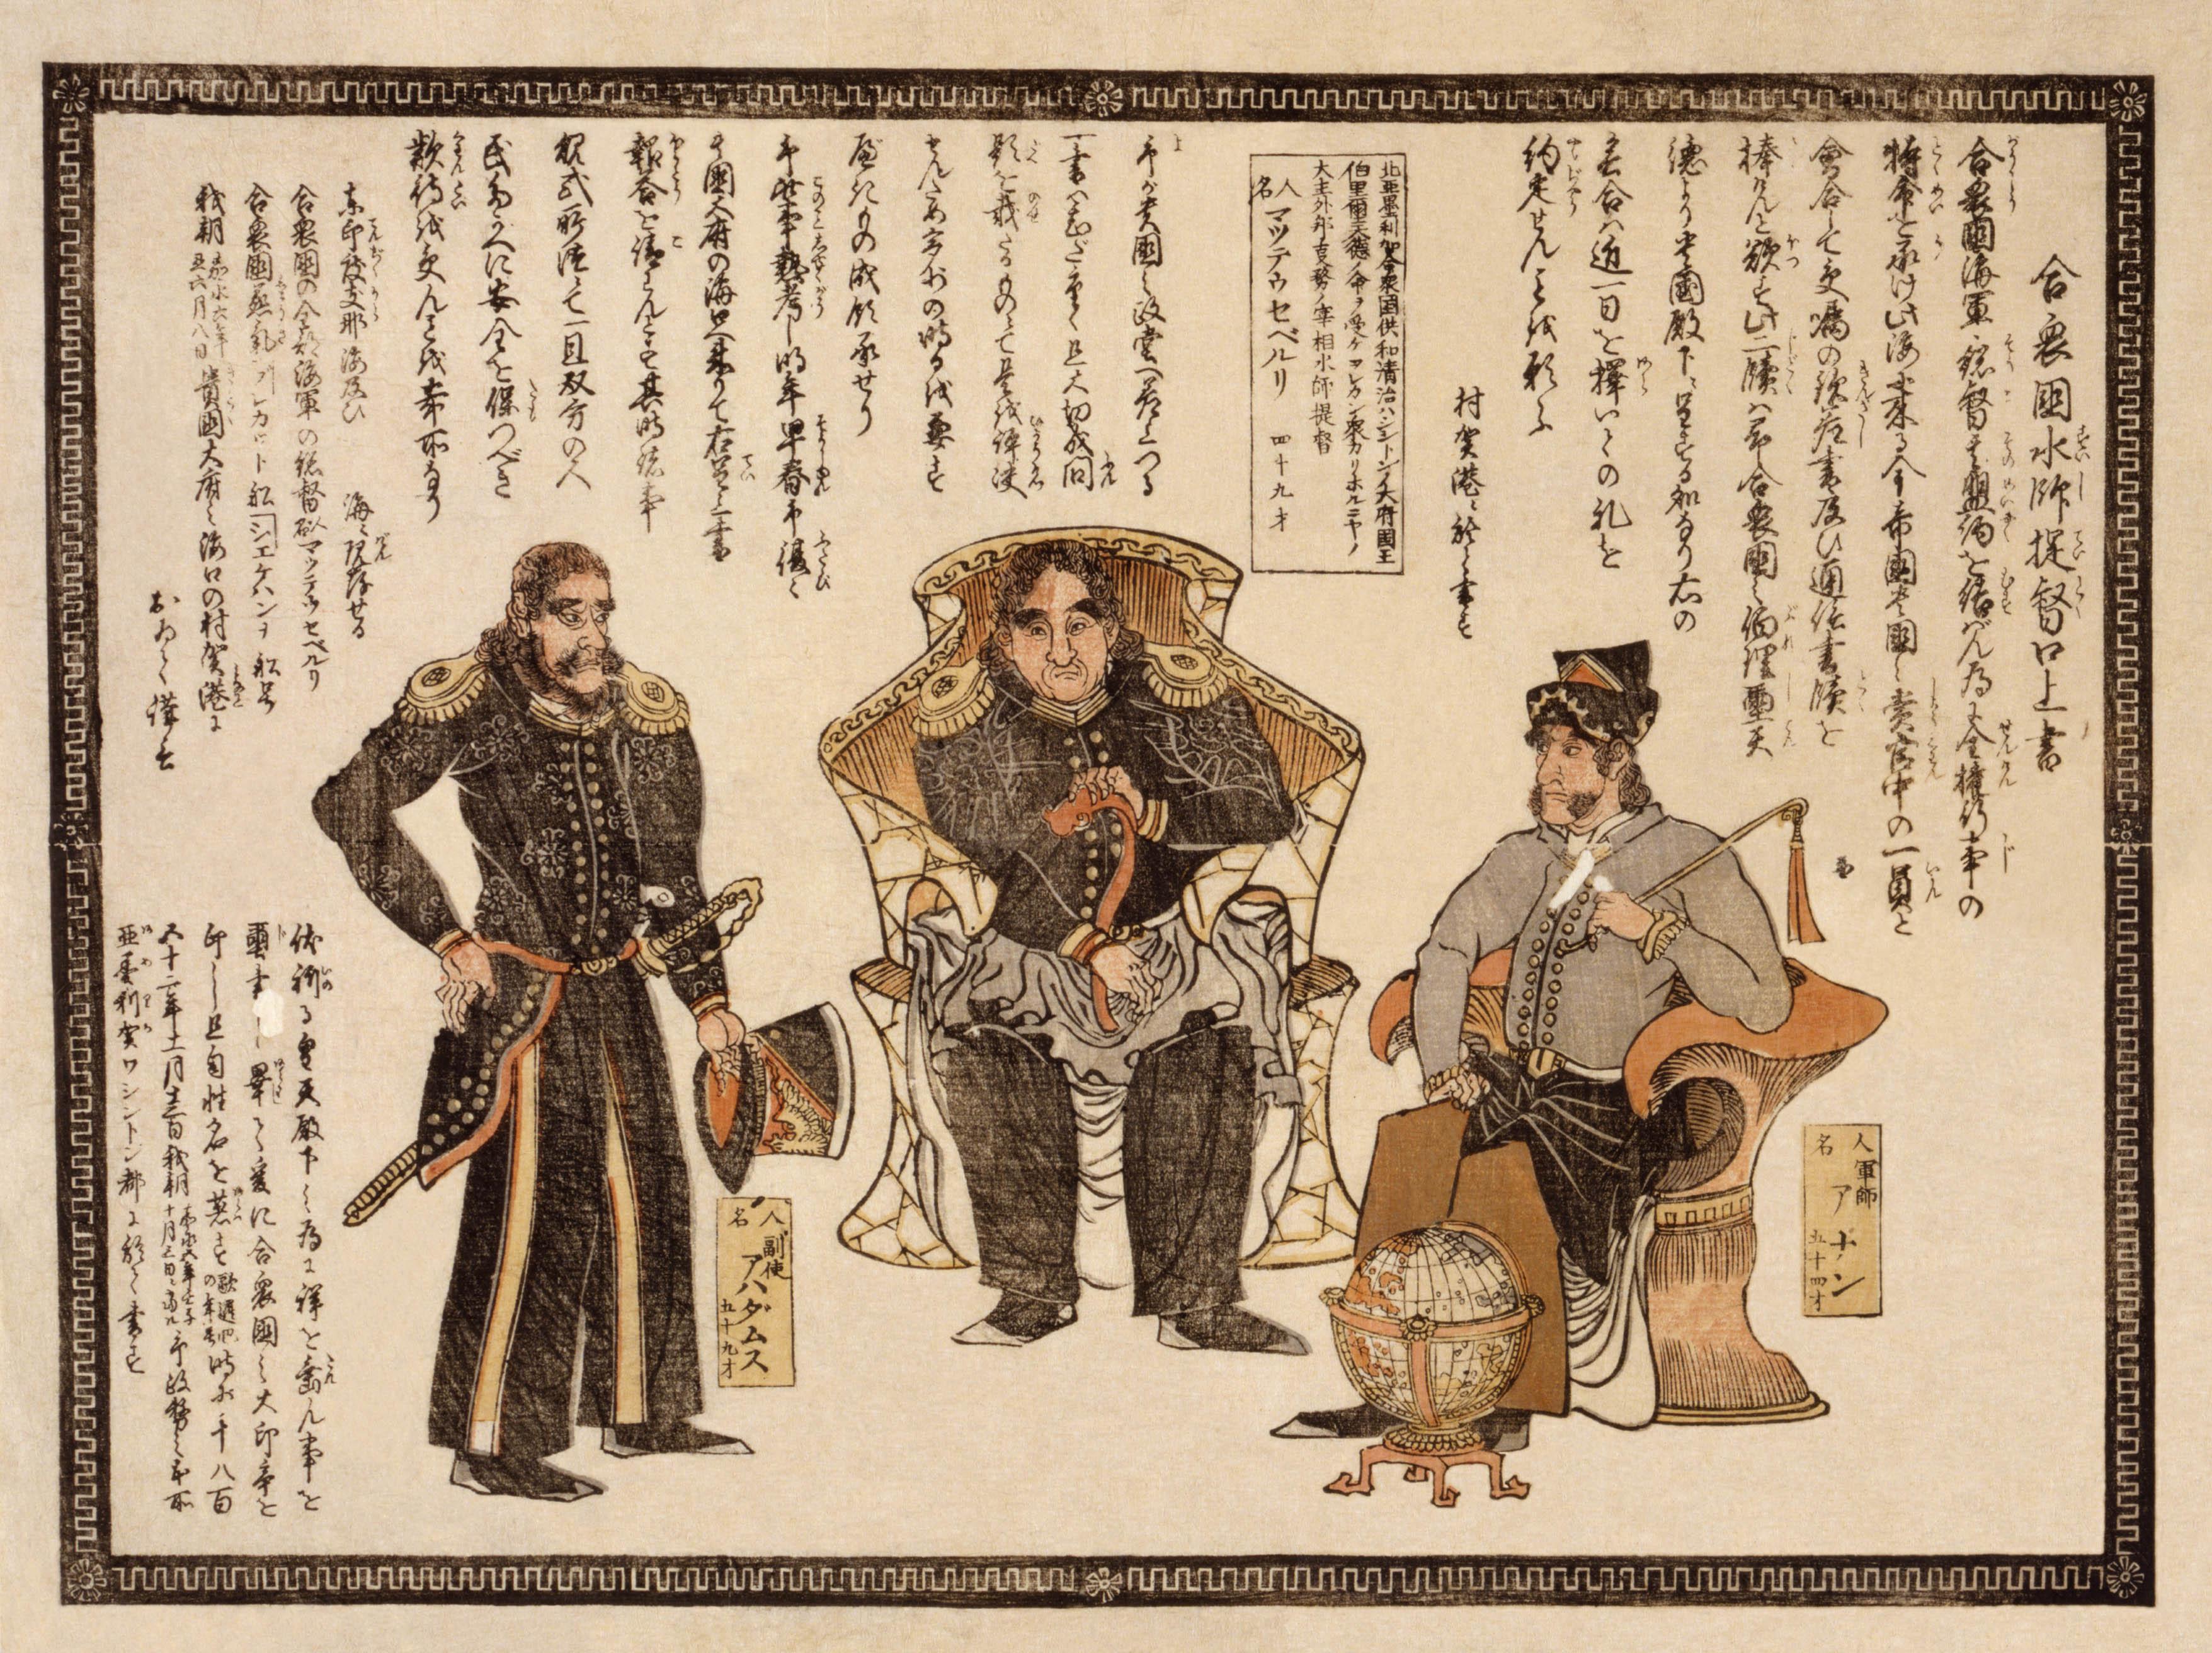 Gasshukoku_suishi_teitoku_kōjōgaki_(Oral_statement_by_the_American_Navy_admiral) Gasshukoku suishi teitoku kōjōgaki (Oral statement by the American Navy admiral)